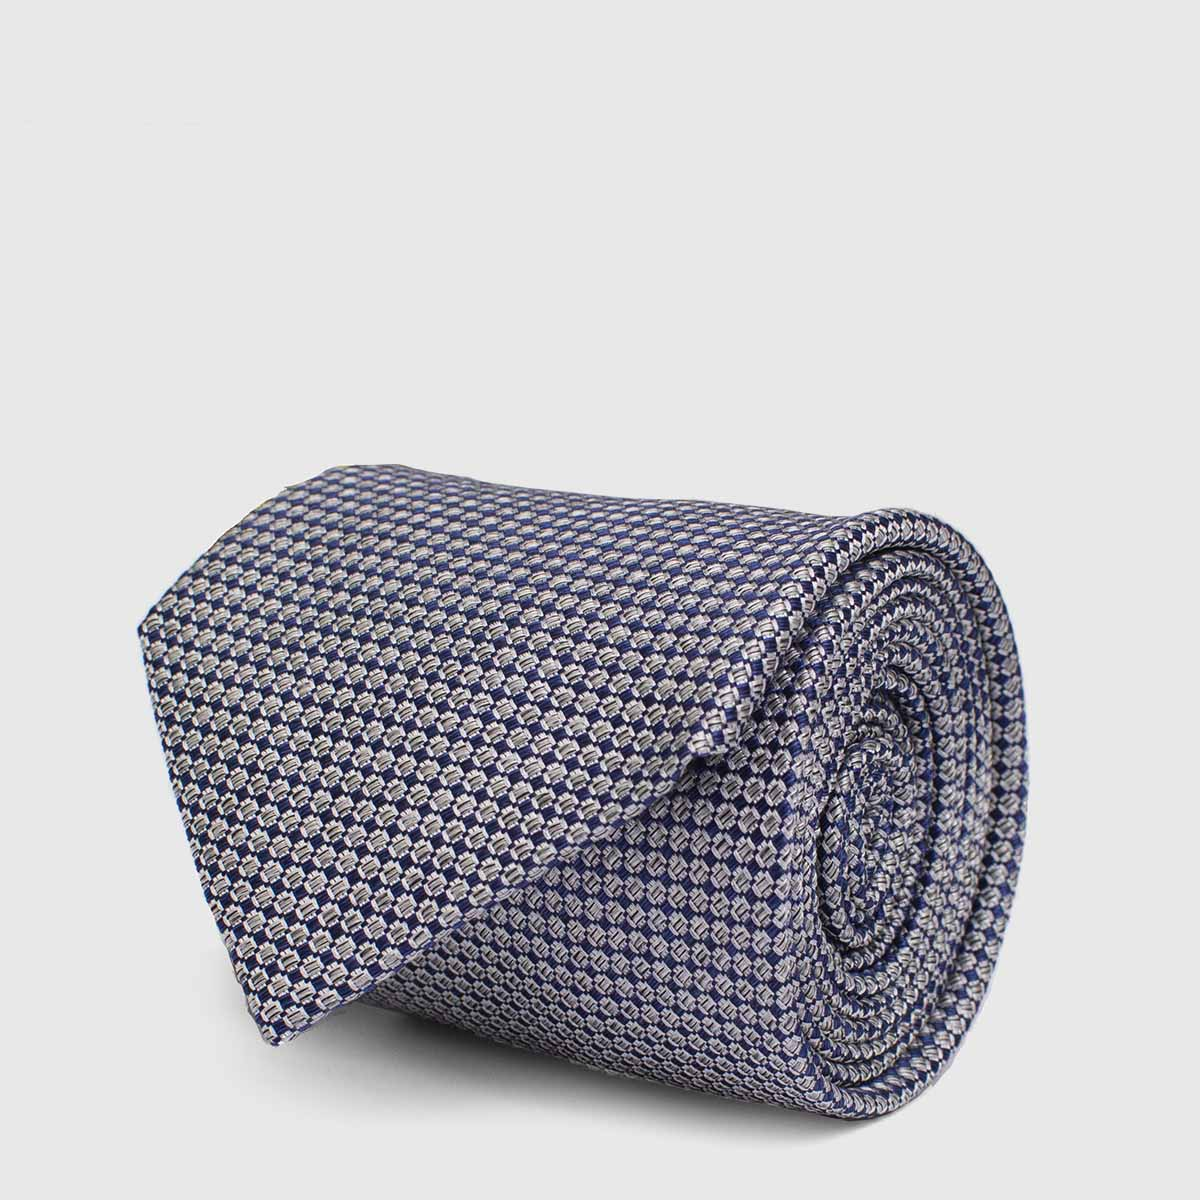 100% Blue and White Silk Tie